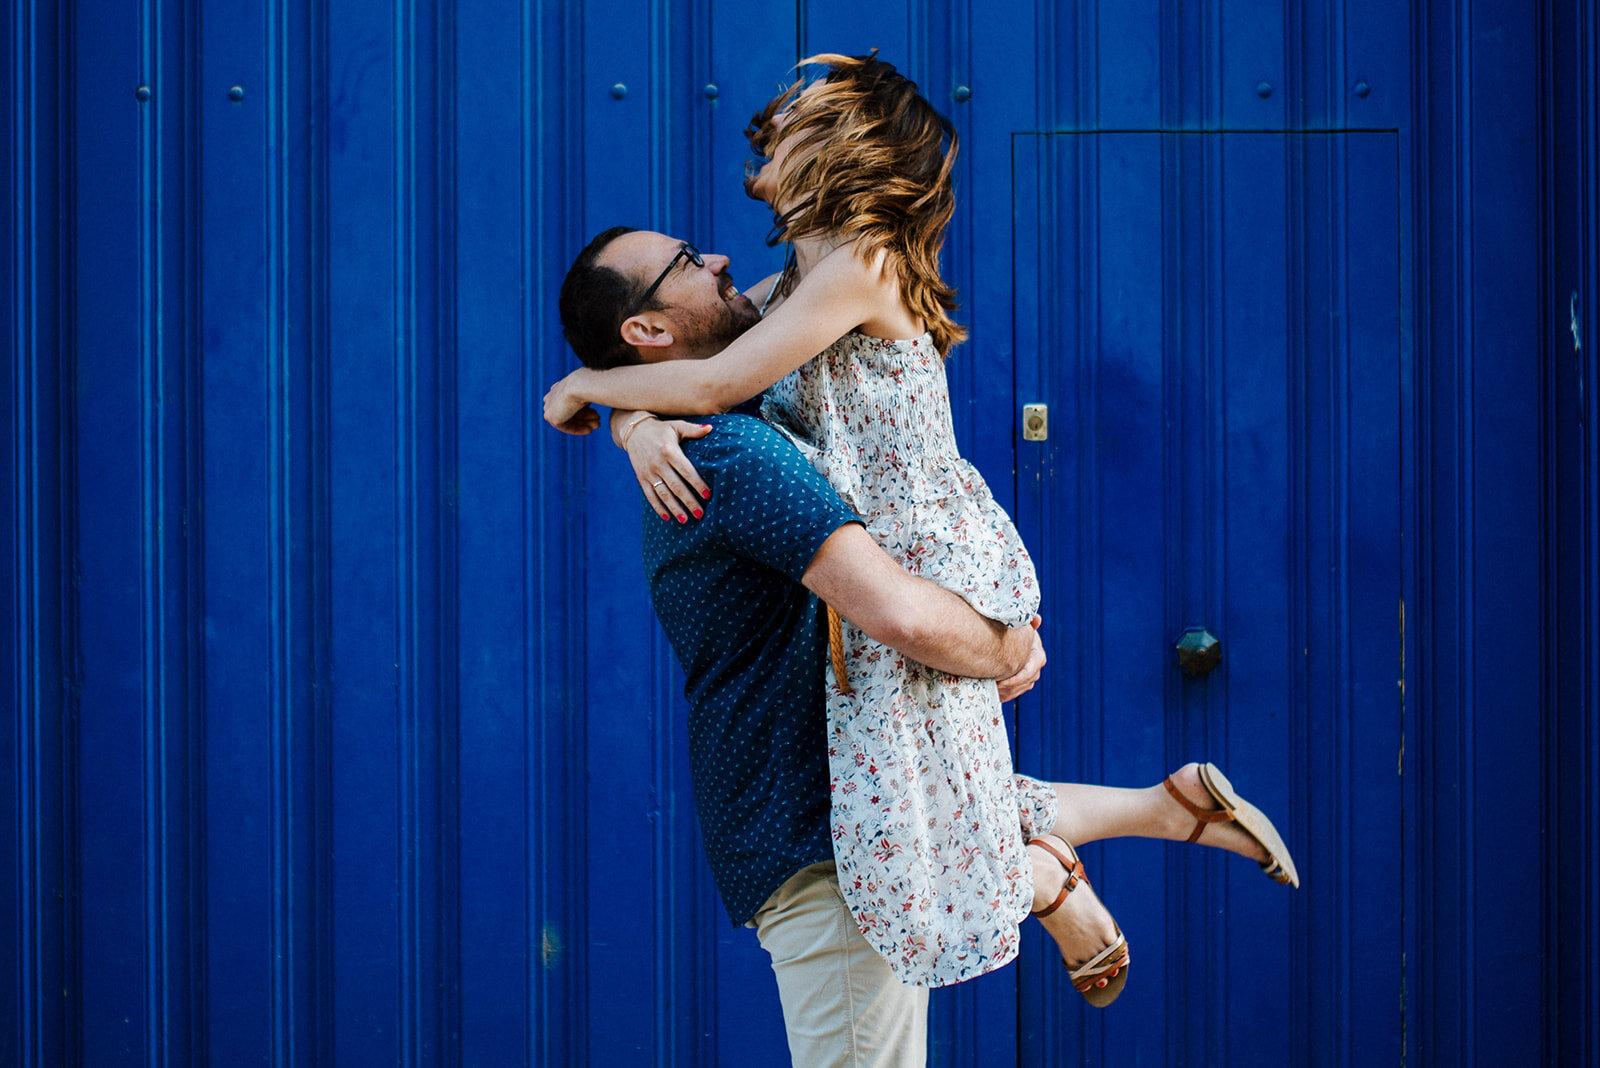 Photographe Mariage et couple Perpignan13.jpg